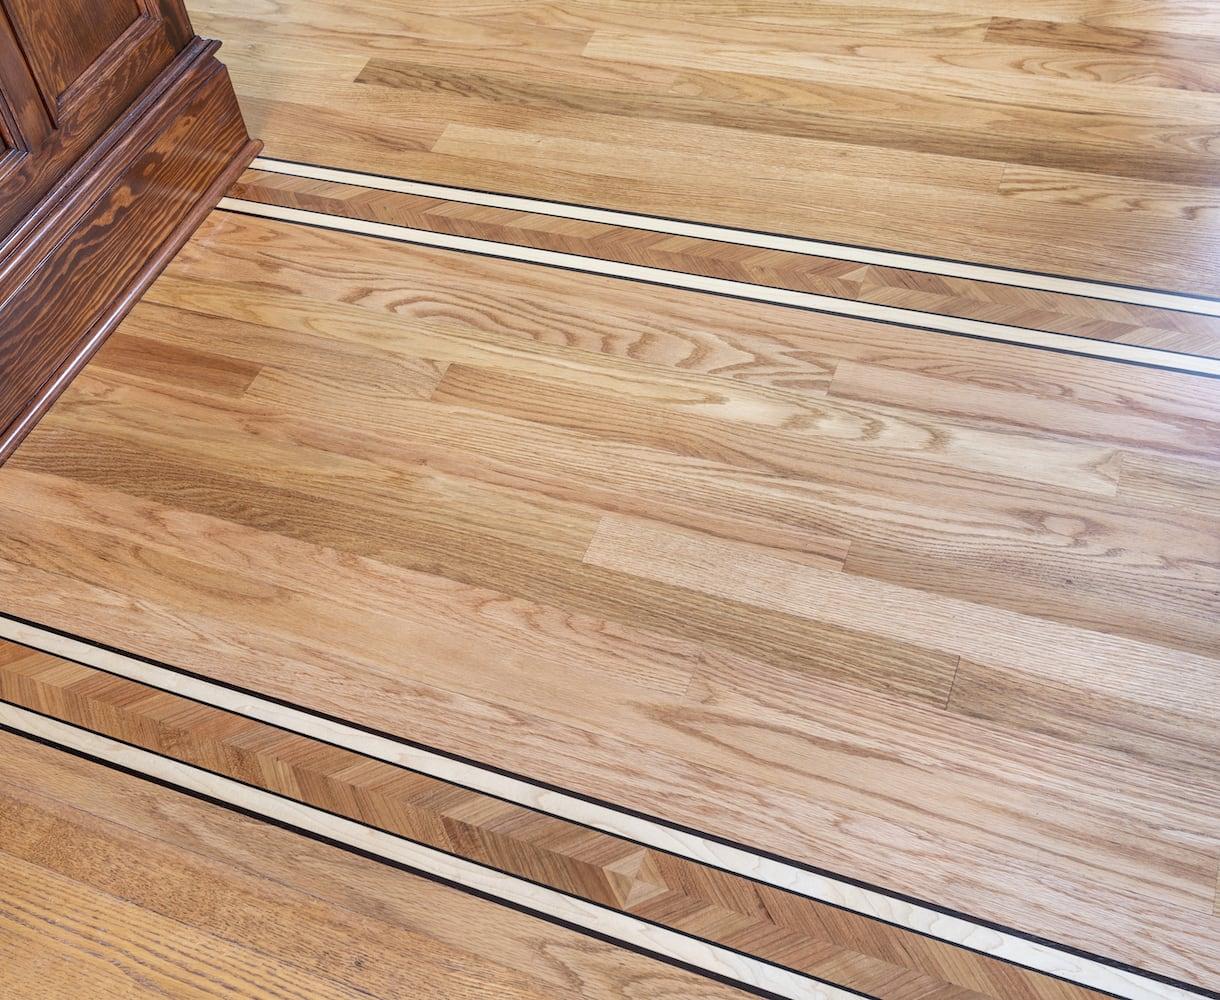 Willamette Heights - wood floor inlay, traditional home